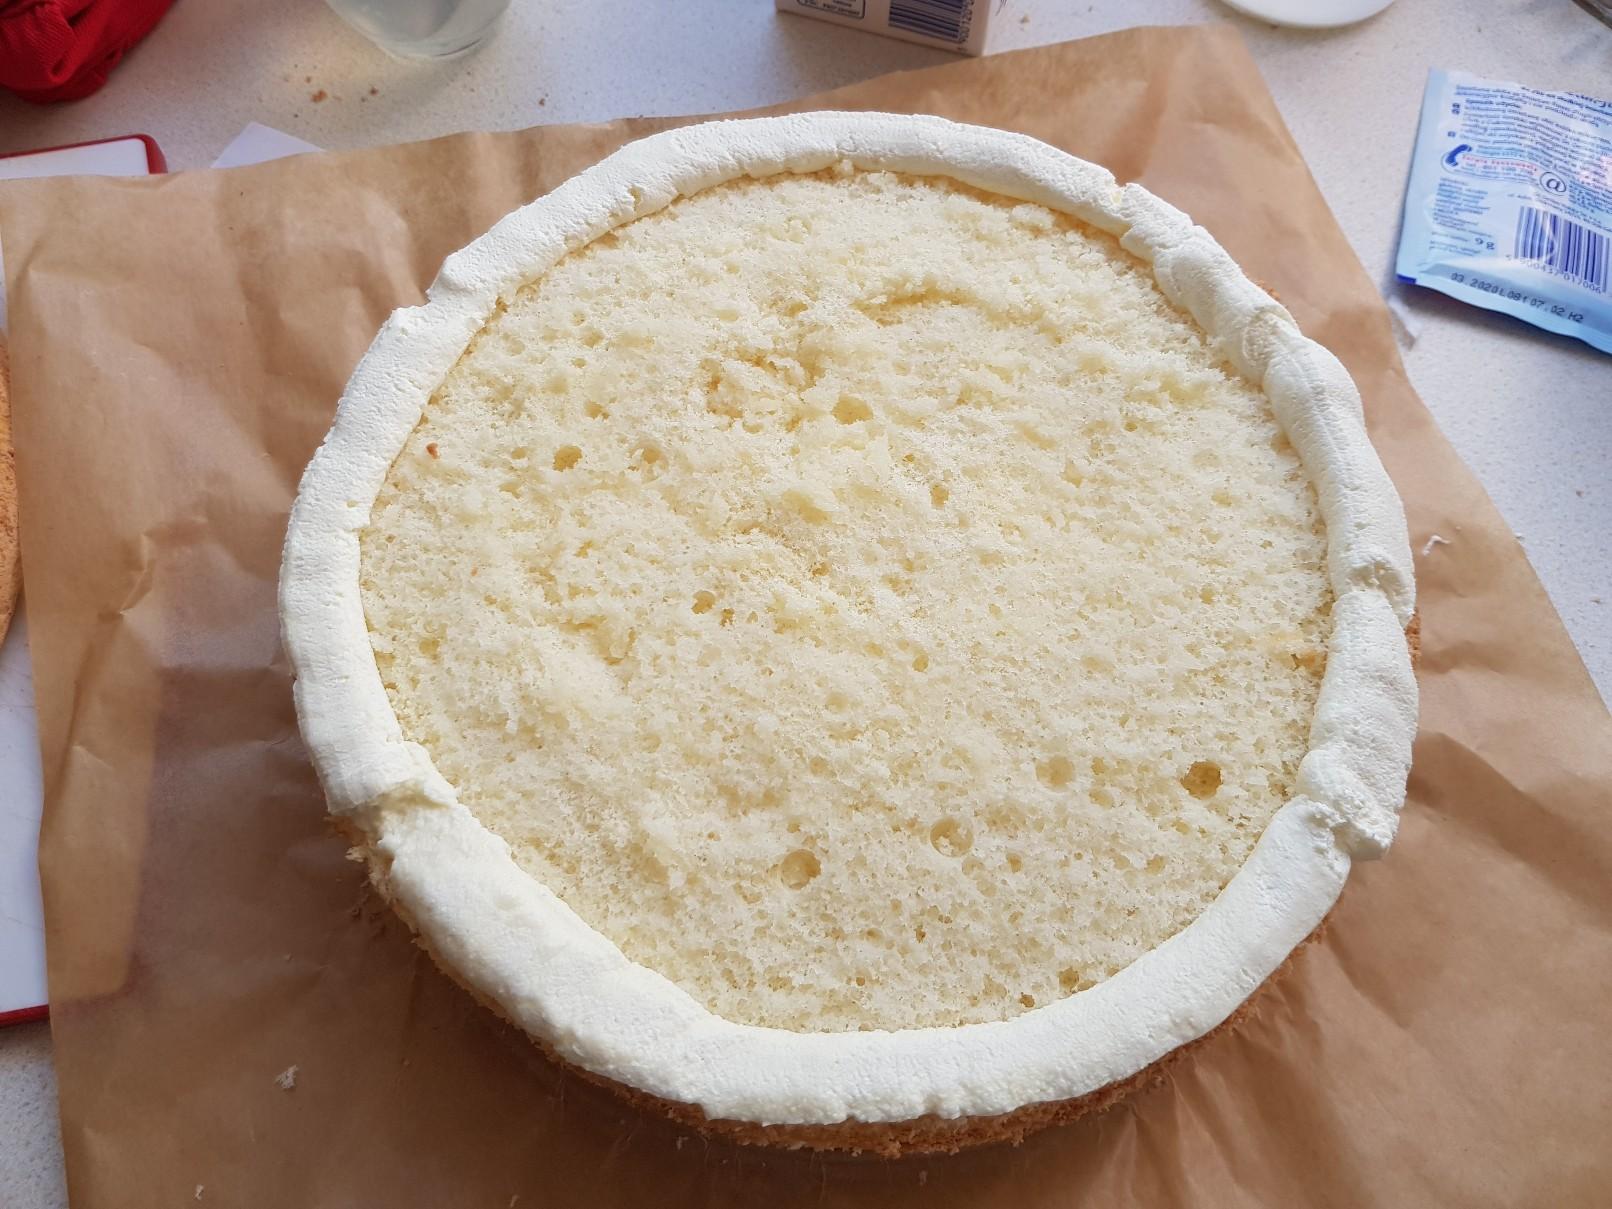 space birthday cake cream filling